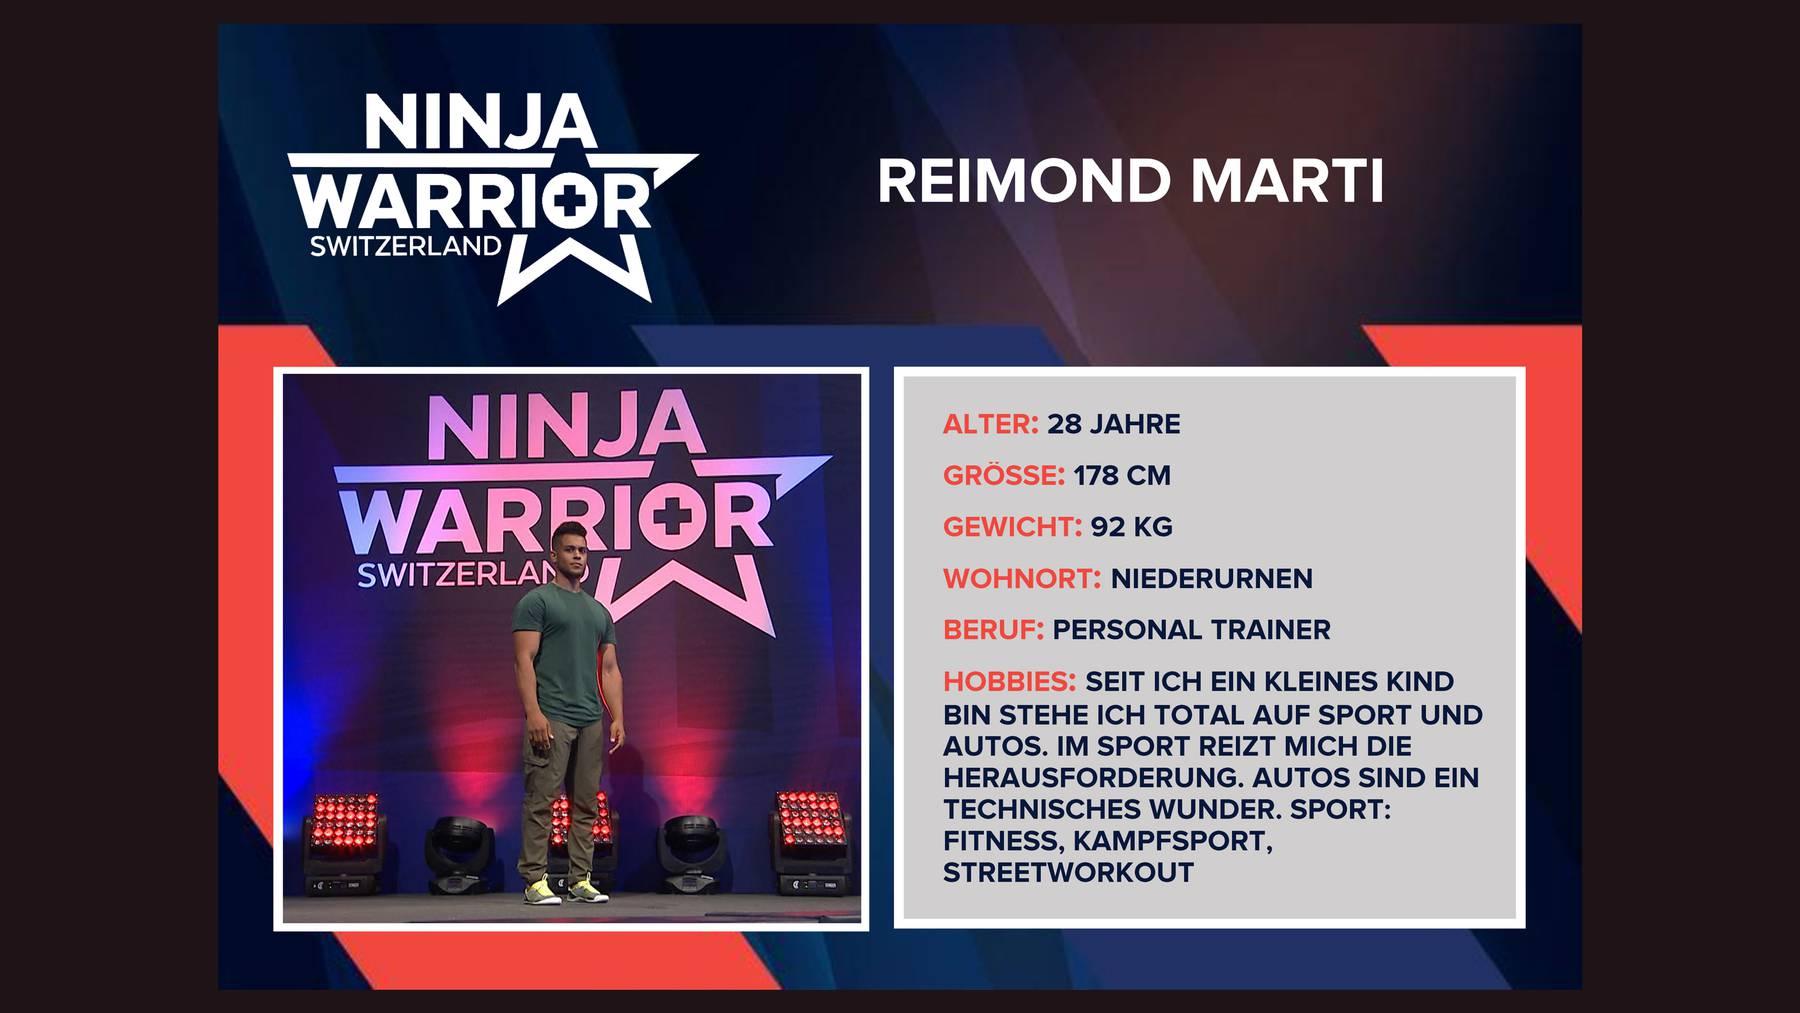 Reimond Marti